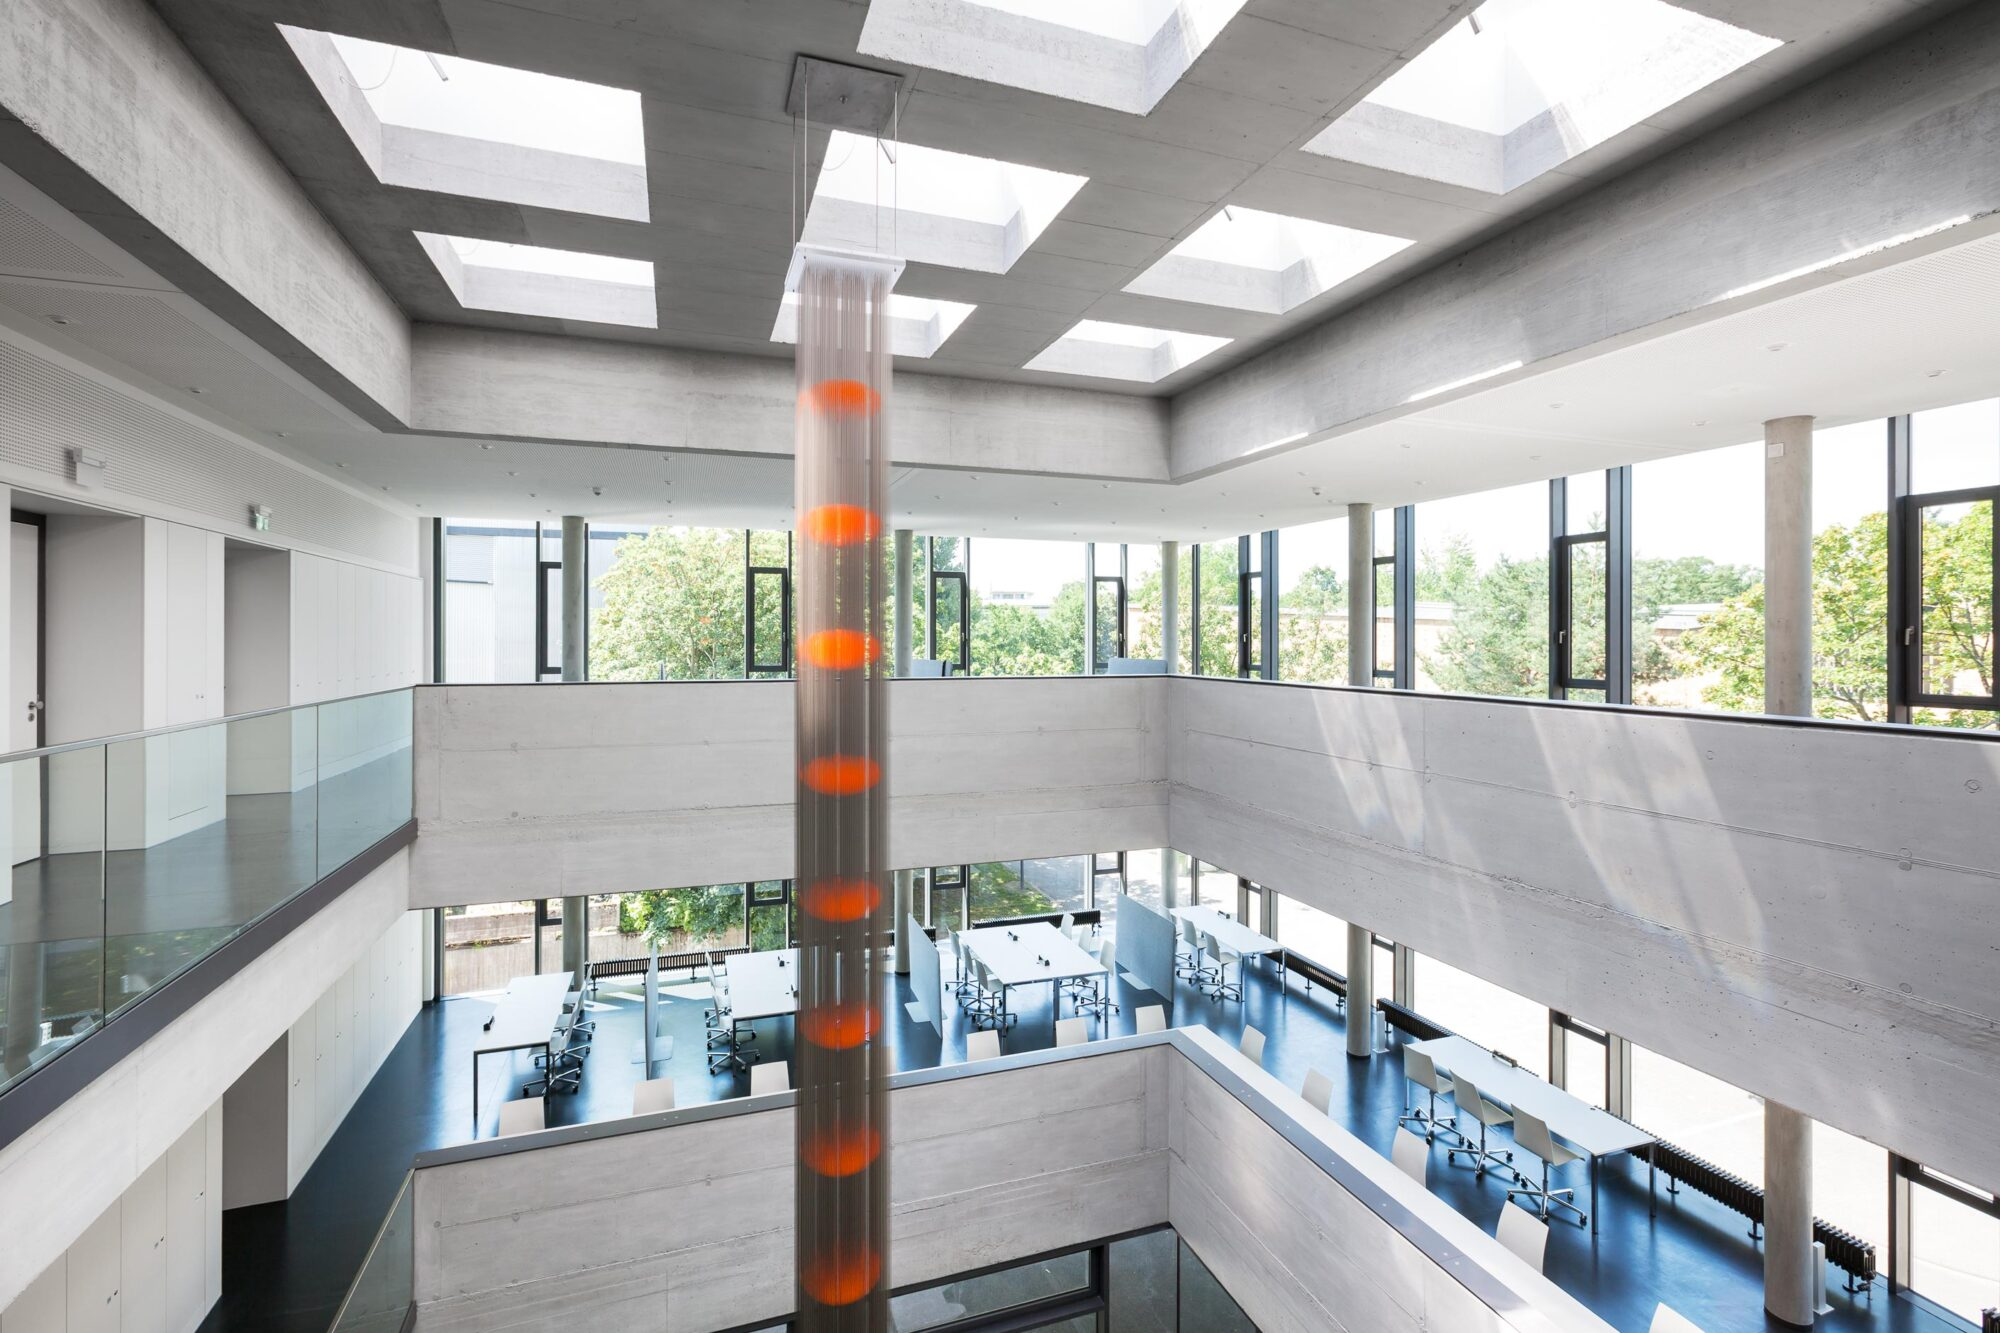 feco-feederle│Büroeinrichtung Karlsruhe│KIT Lernzentrum, Karlsruhe